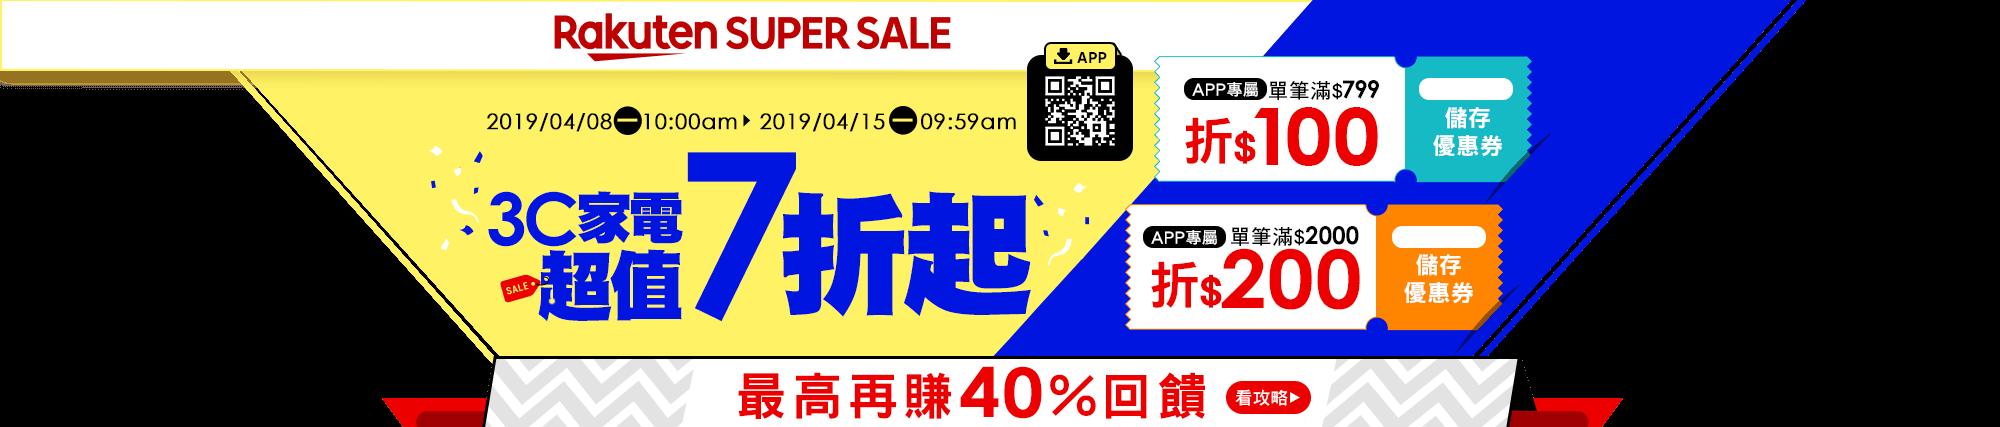 SUPER SALE超級特賣週:3C家電超值7折起,最高再賺40%點數回饋